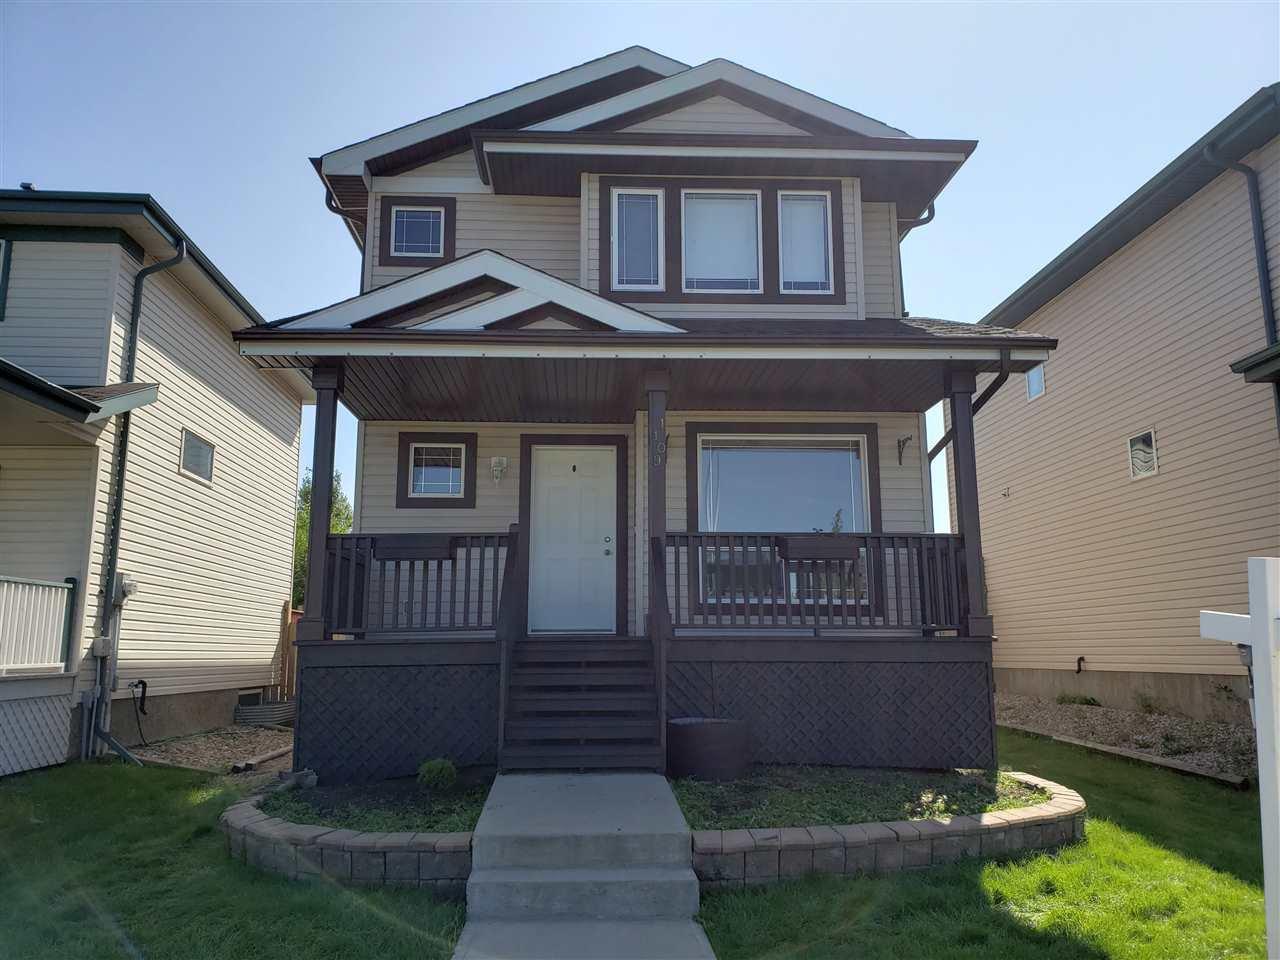 Main Photo: 1109 HYNDMAN Road in Edmonton: Zone 35 House for sale : MLS®# E4165252